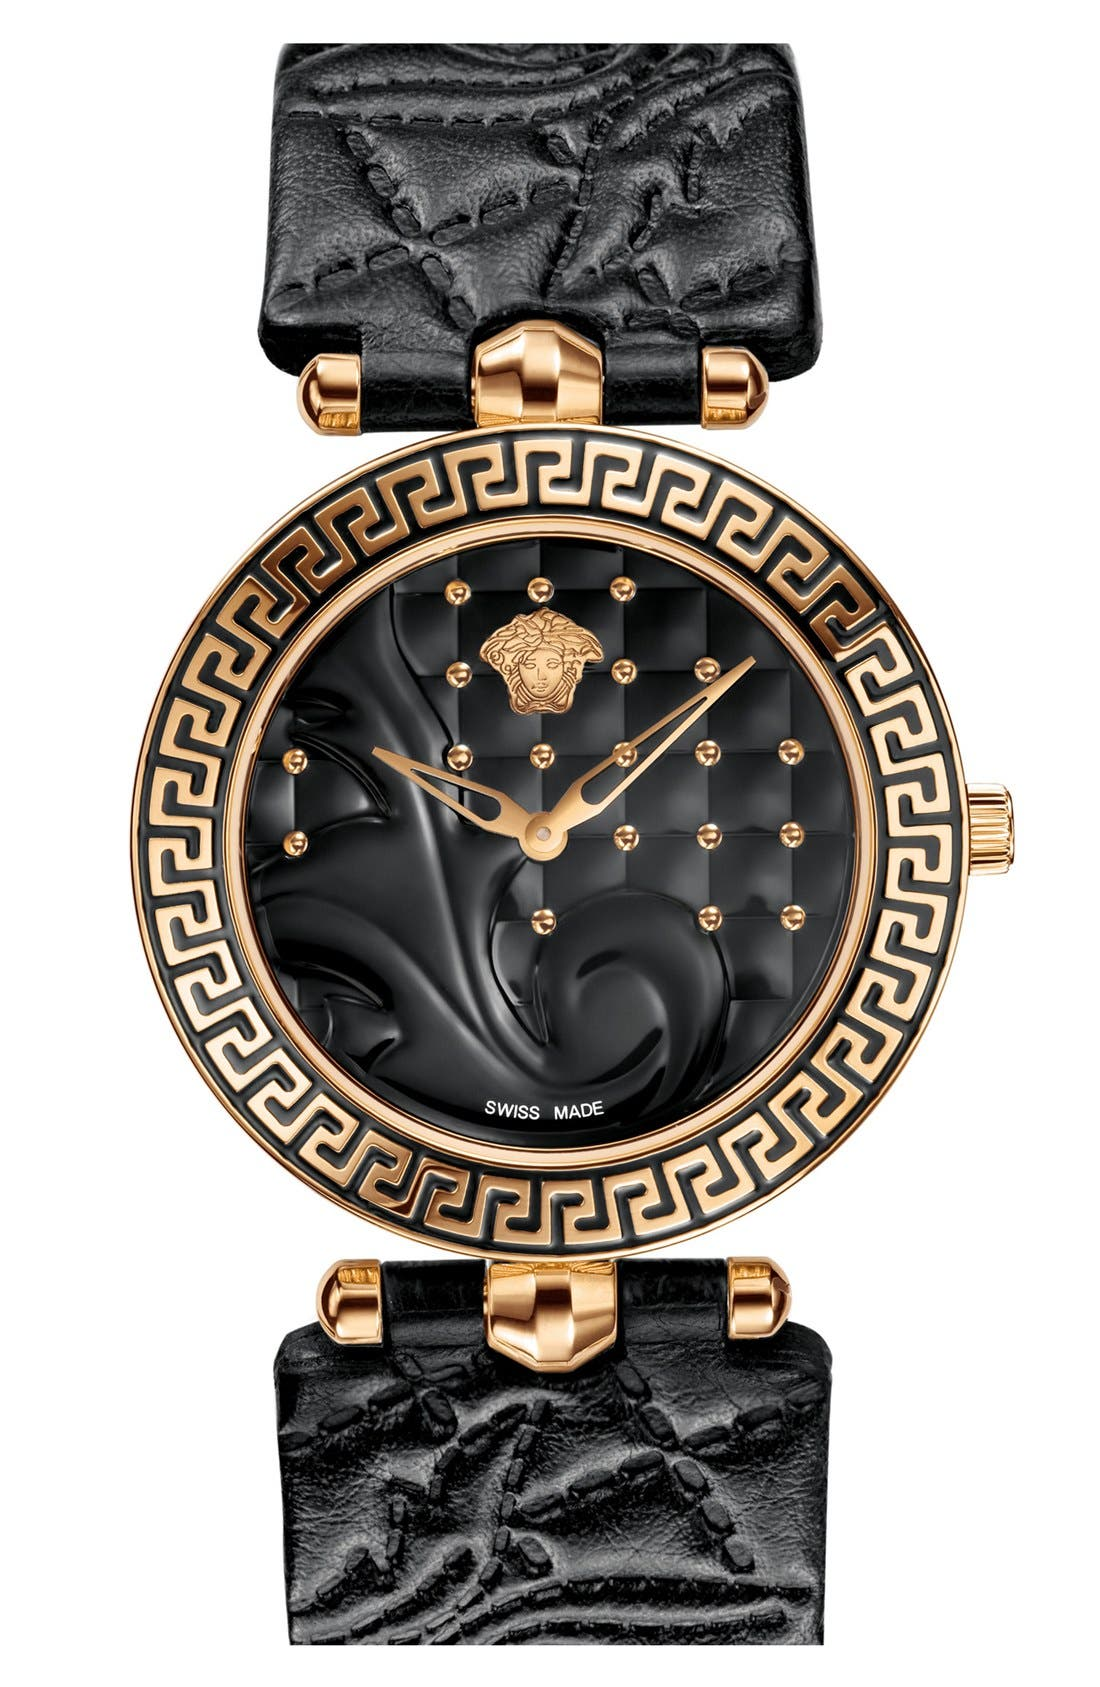 Alternate Image 1 Selected - Versace 'Vanitas' Baroque Pattern Leather Strap Watch, 40mm